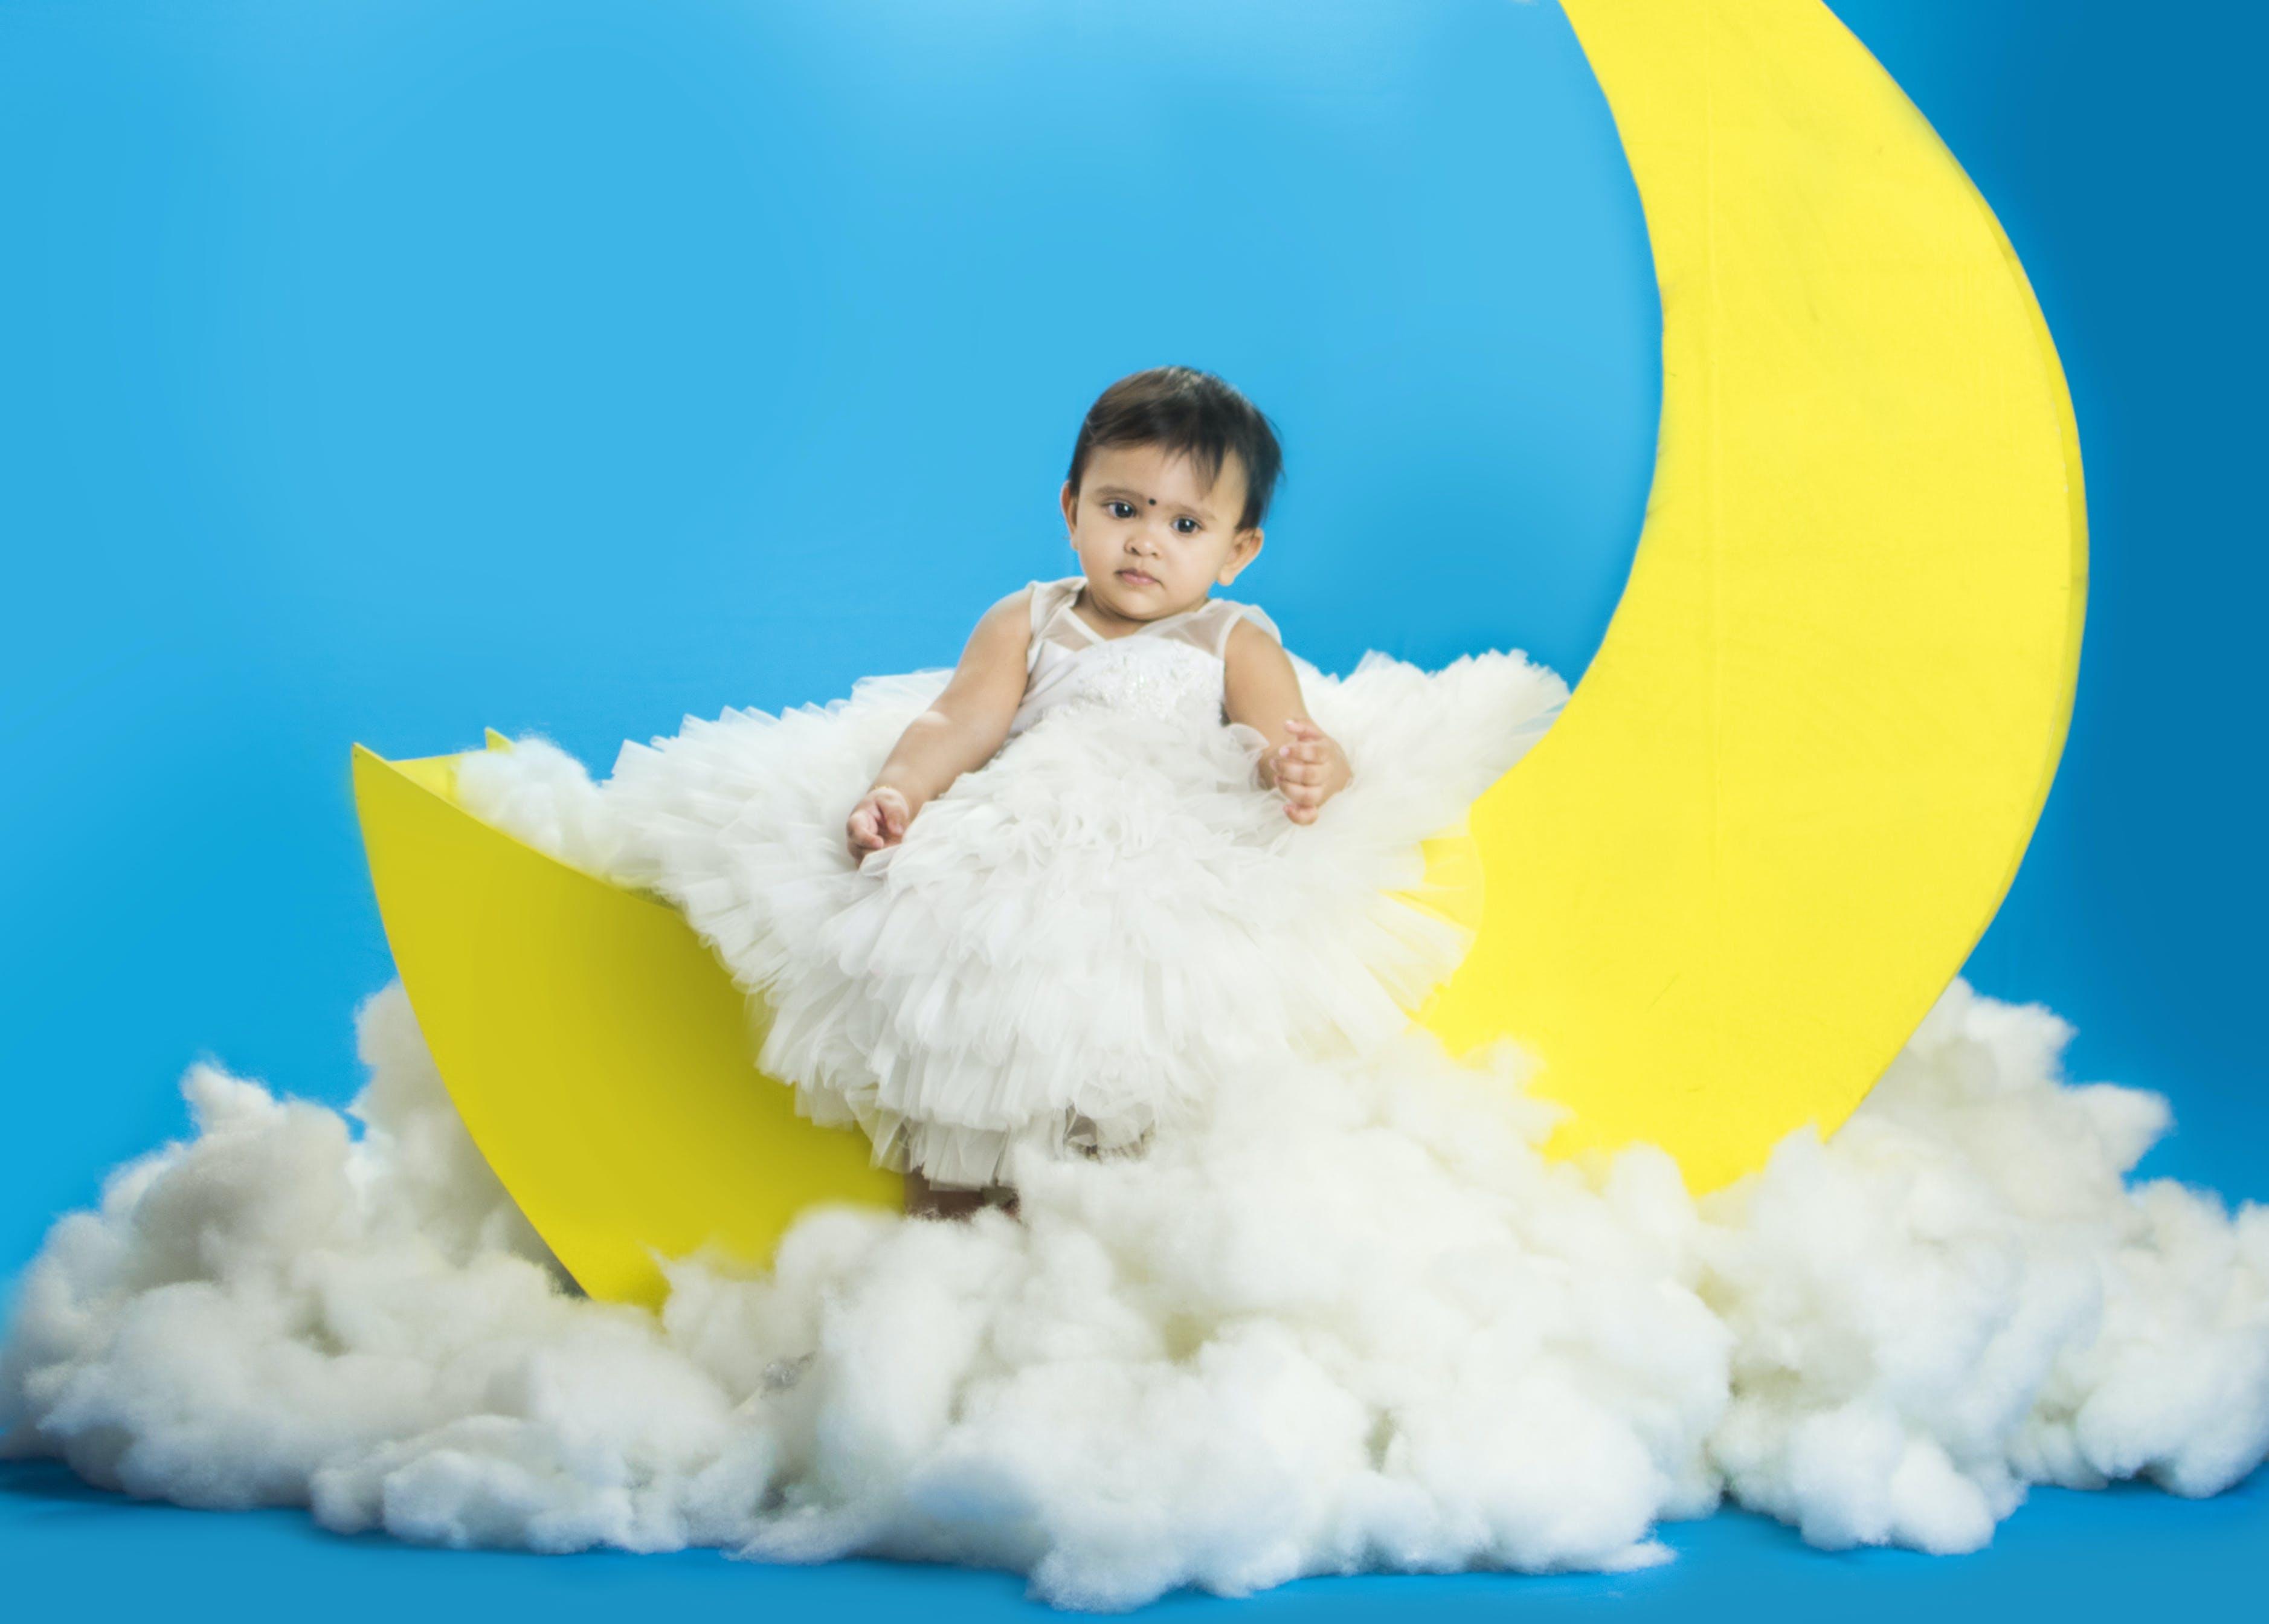 Free stock photo of baby, baby sitting, blue yellow, clowds